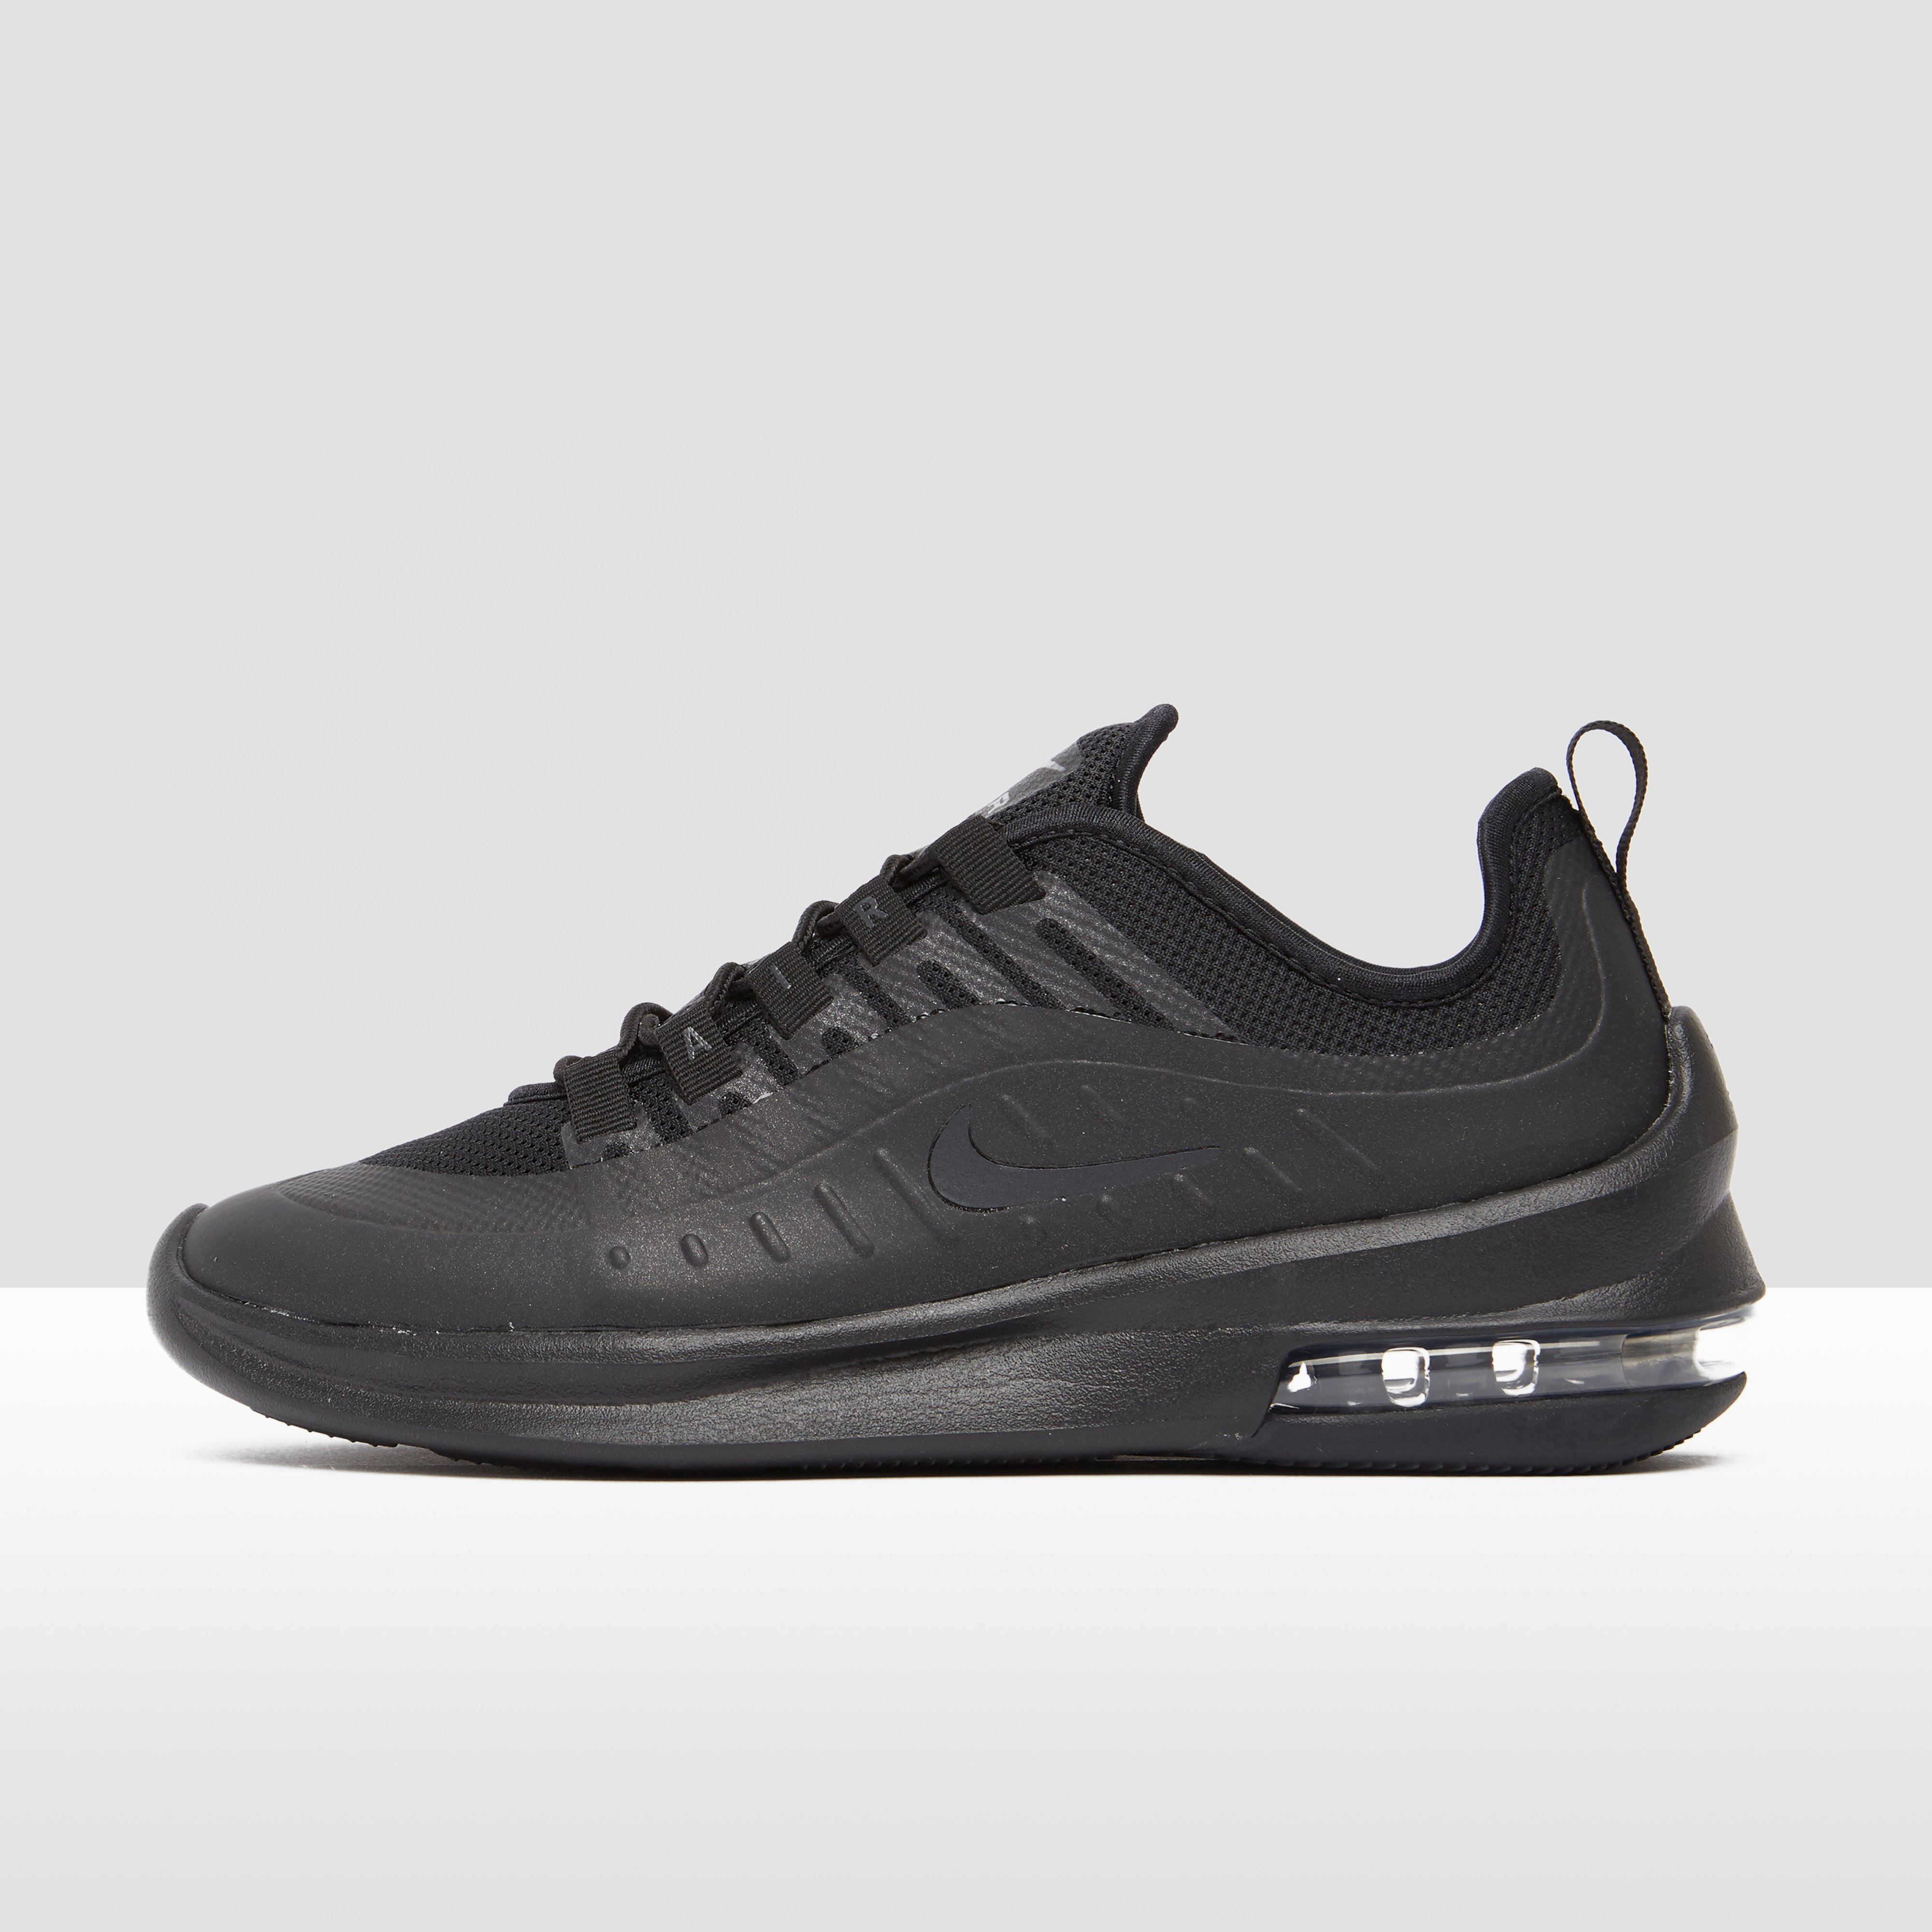 Max Nike Sneakers DamesPerrysport Zwart Axis Air f7by6g